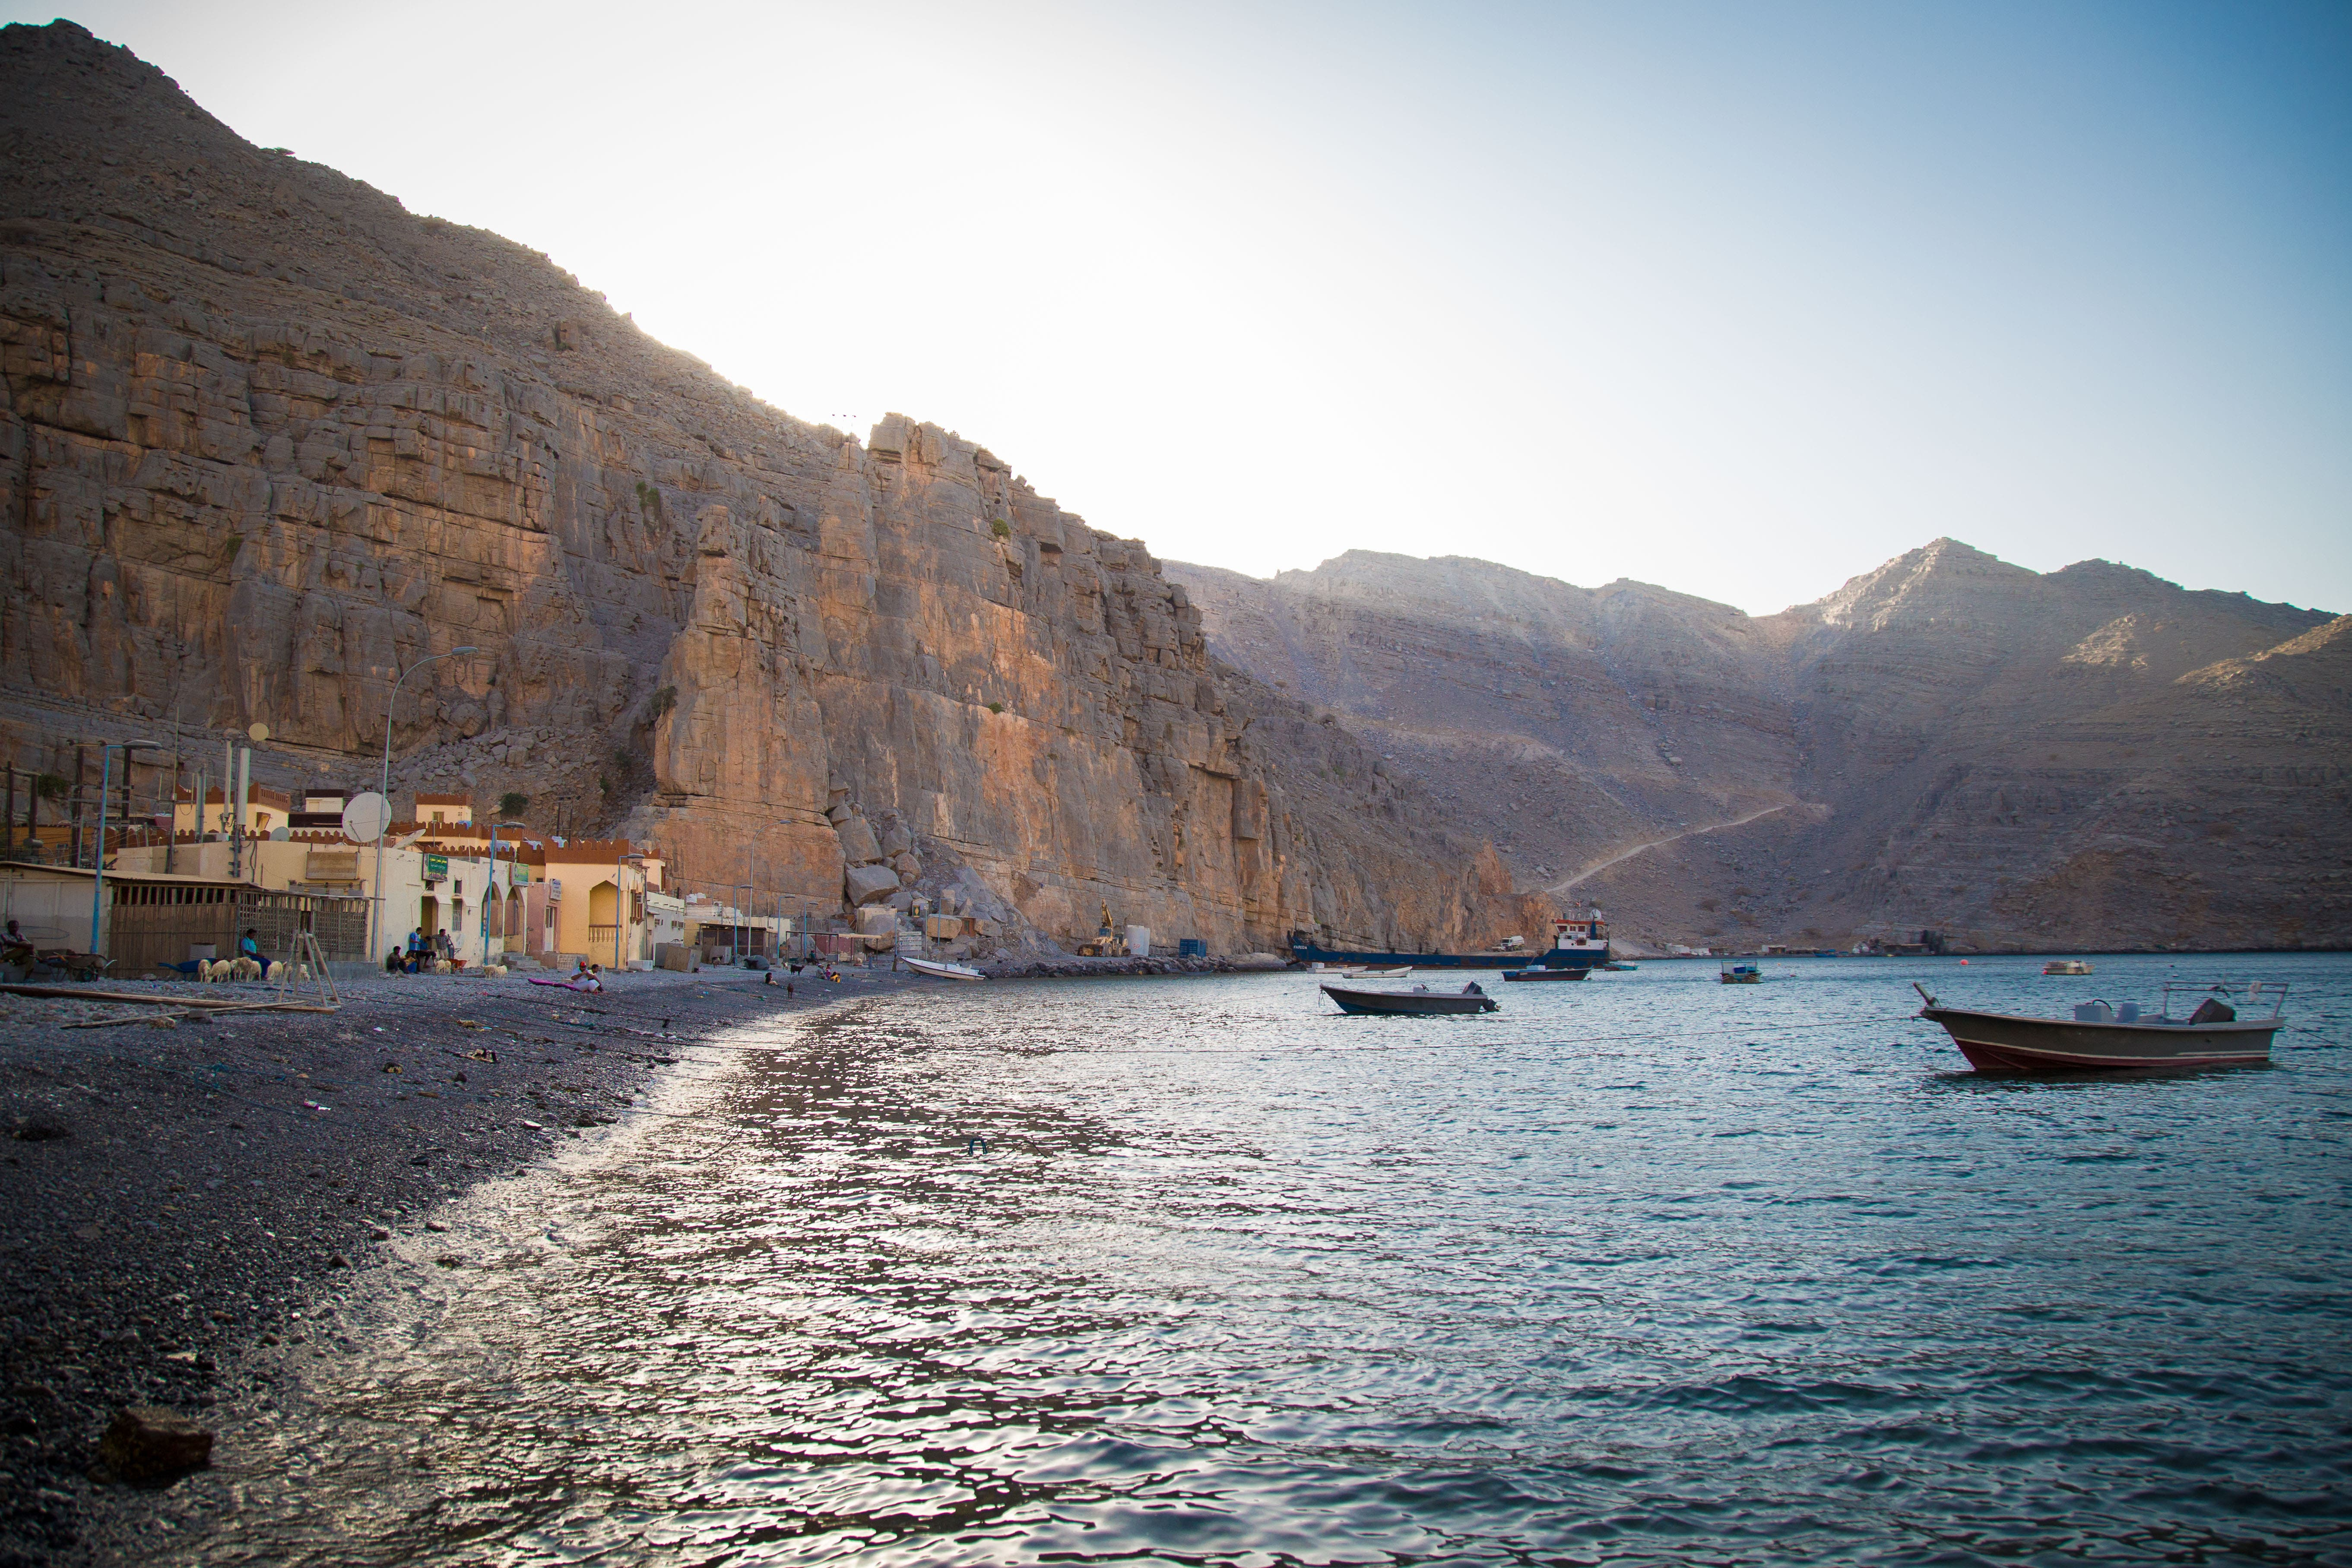 Kumzar's seashore, with the beginnings of the mountain road visible to the right. (Amanda Fisher/Al Arabiya News)